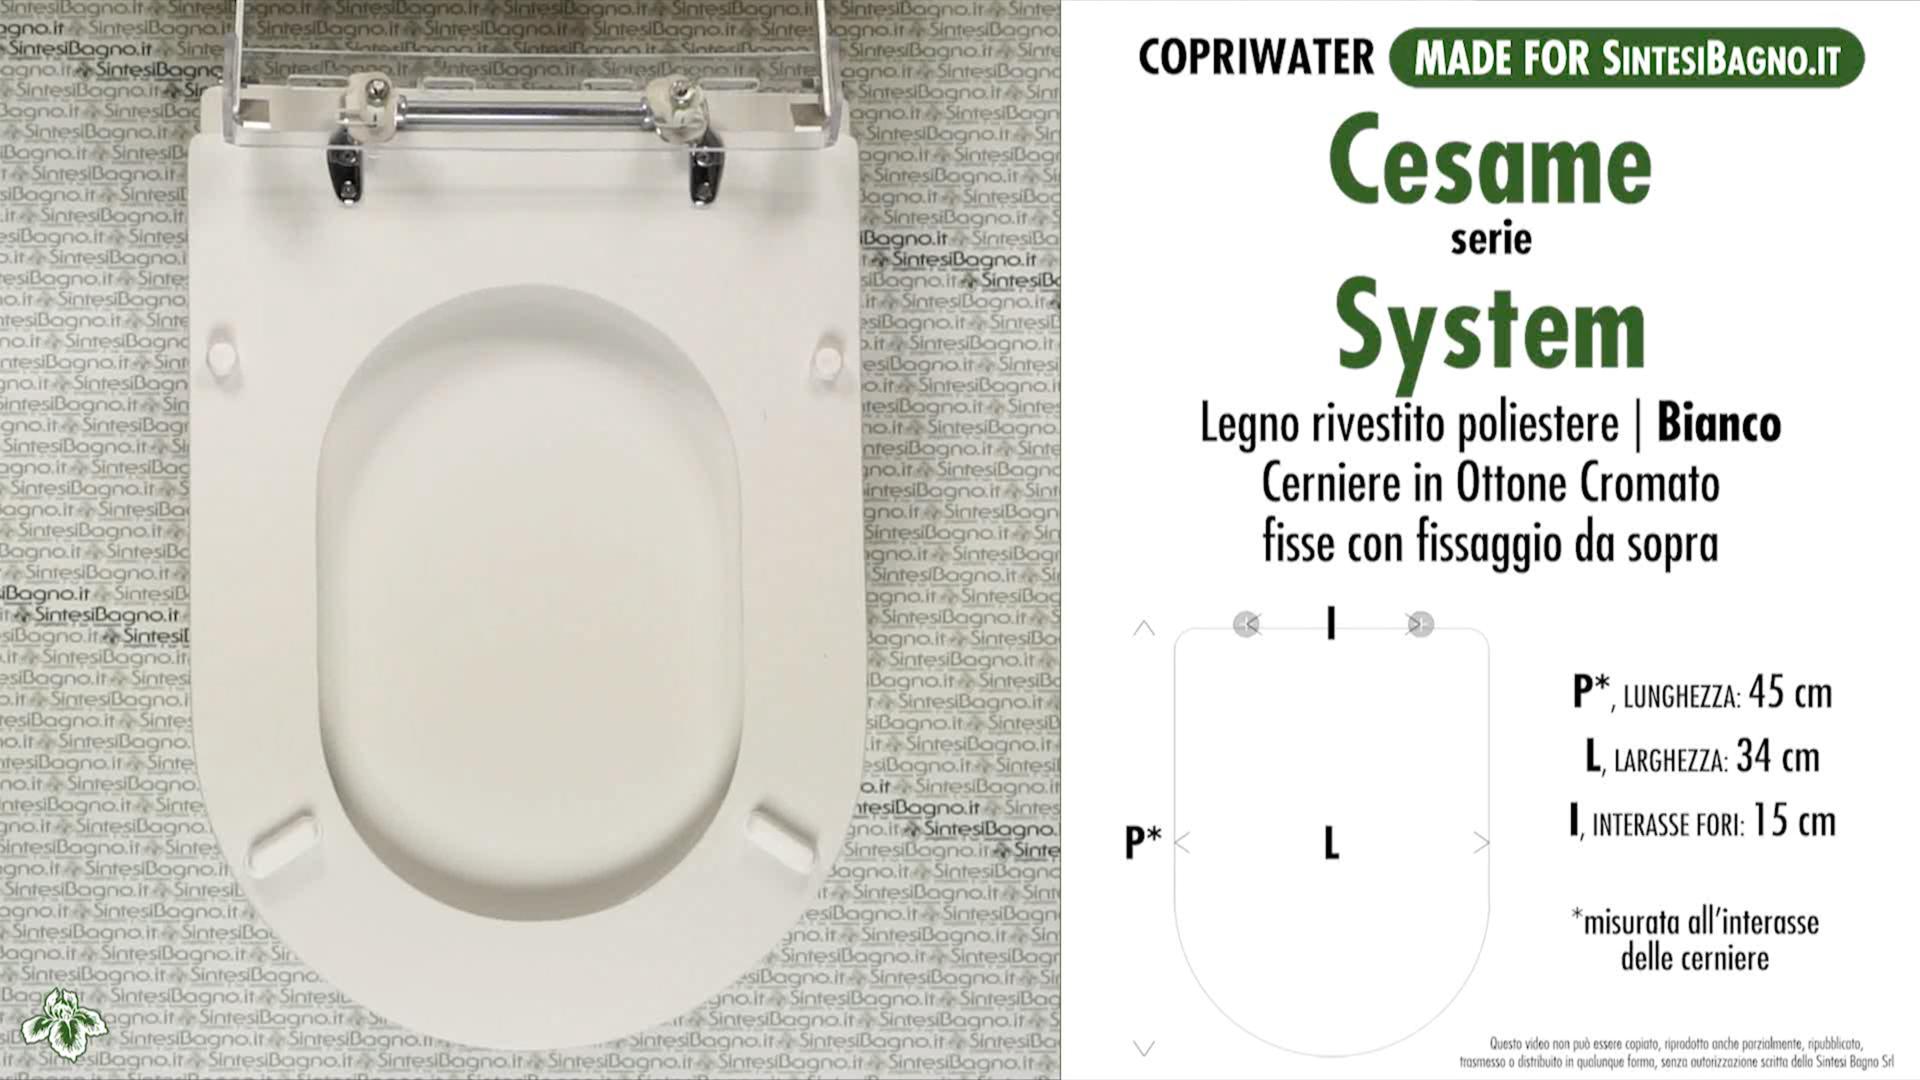 SCHEDA TECNICA MISURE copriwater CESAME SYSTEM